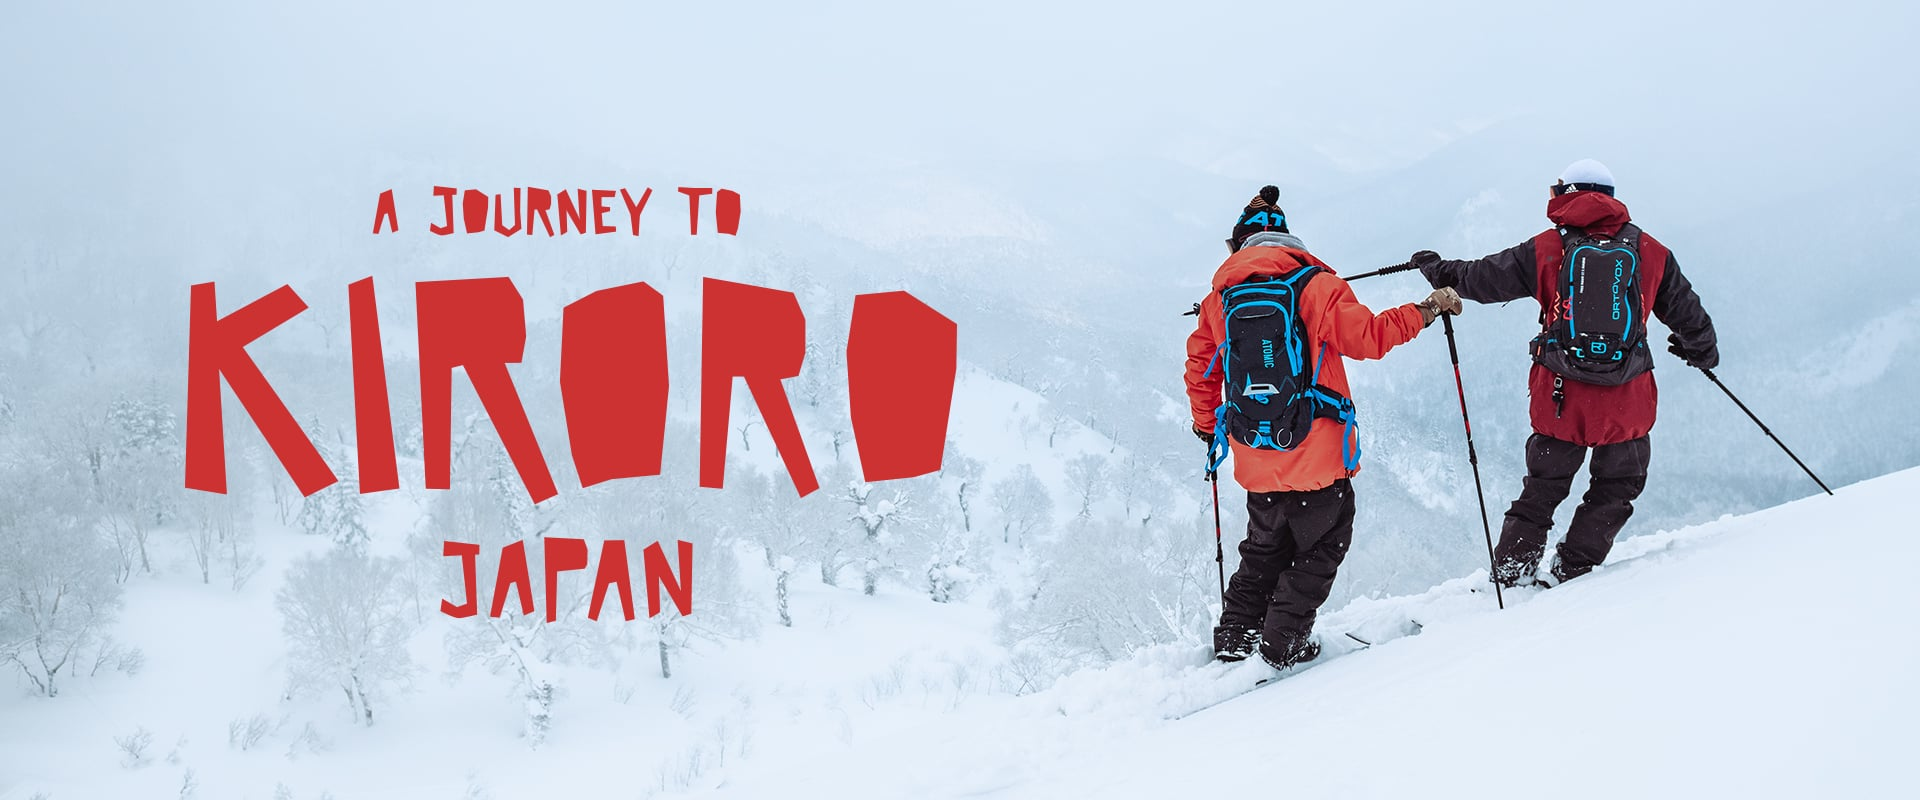 A Journey to Kiroro (Japan) – Headbud